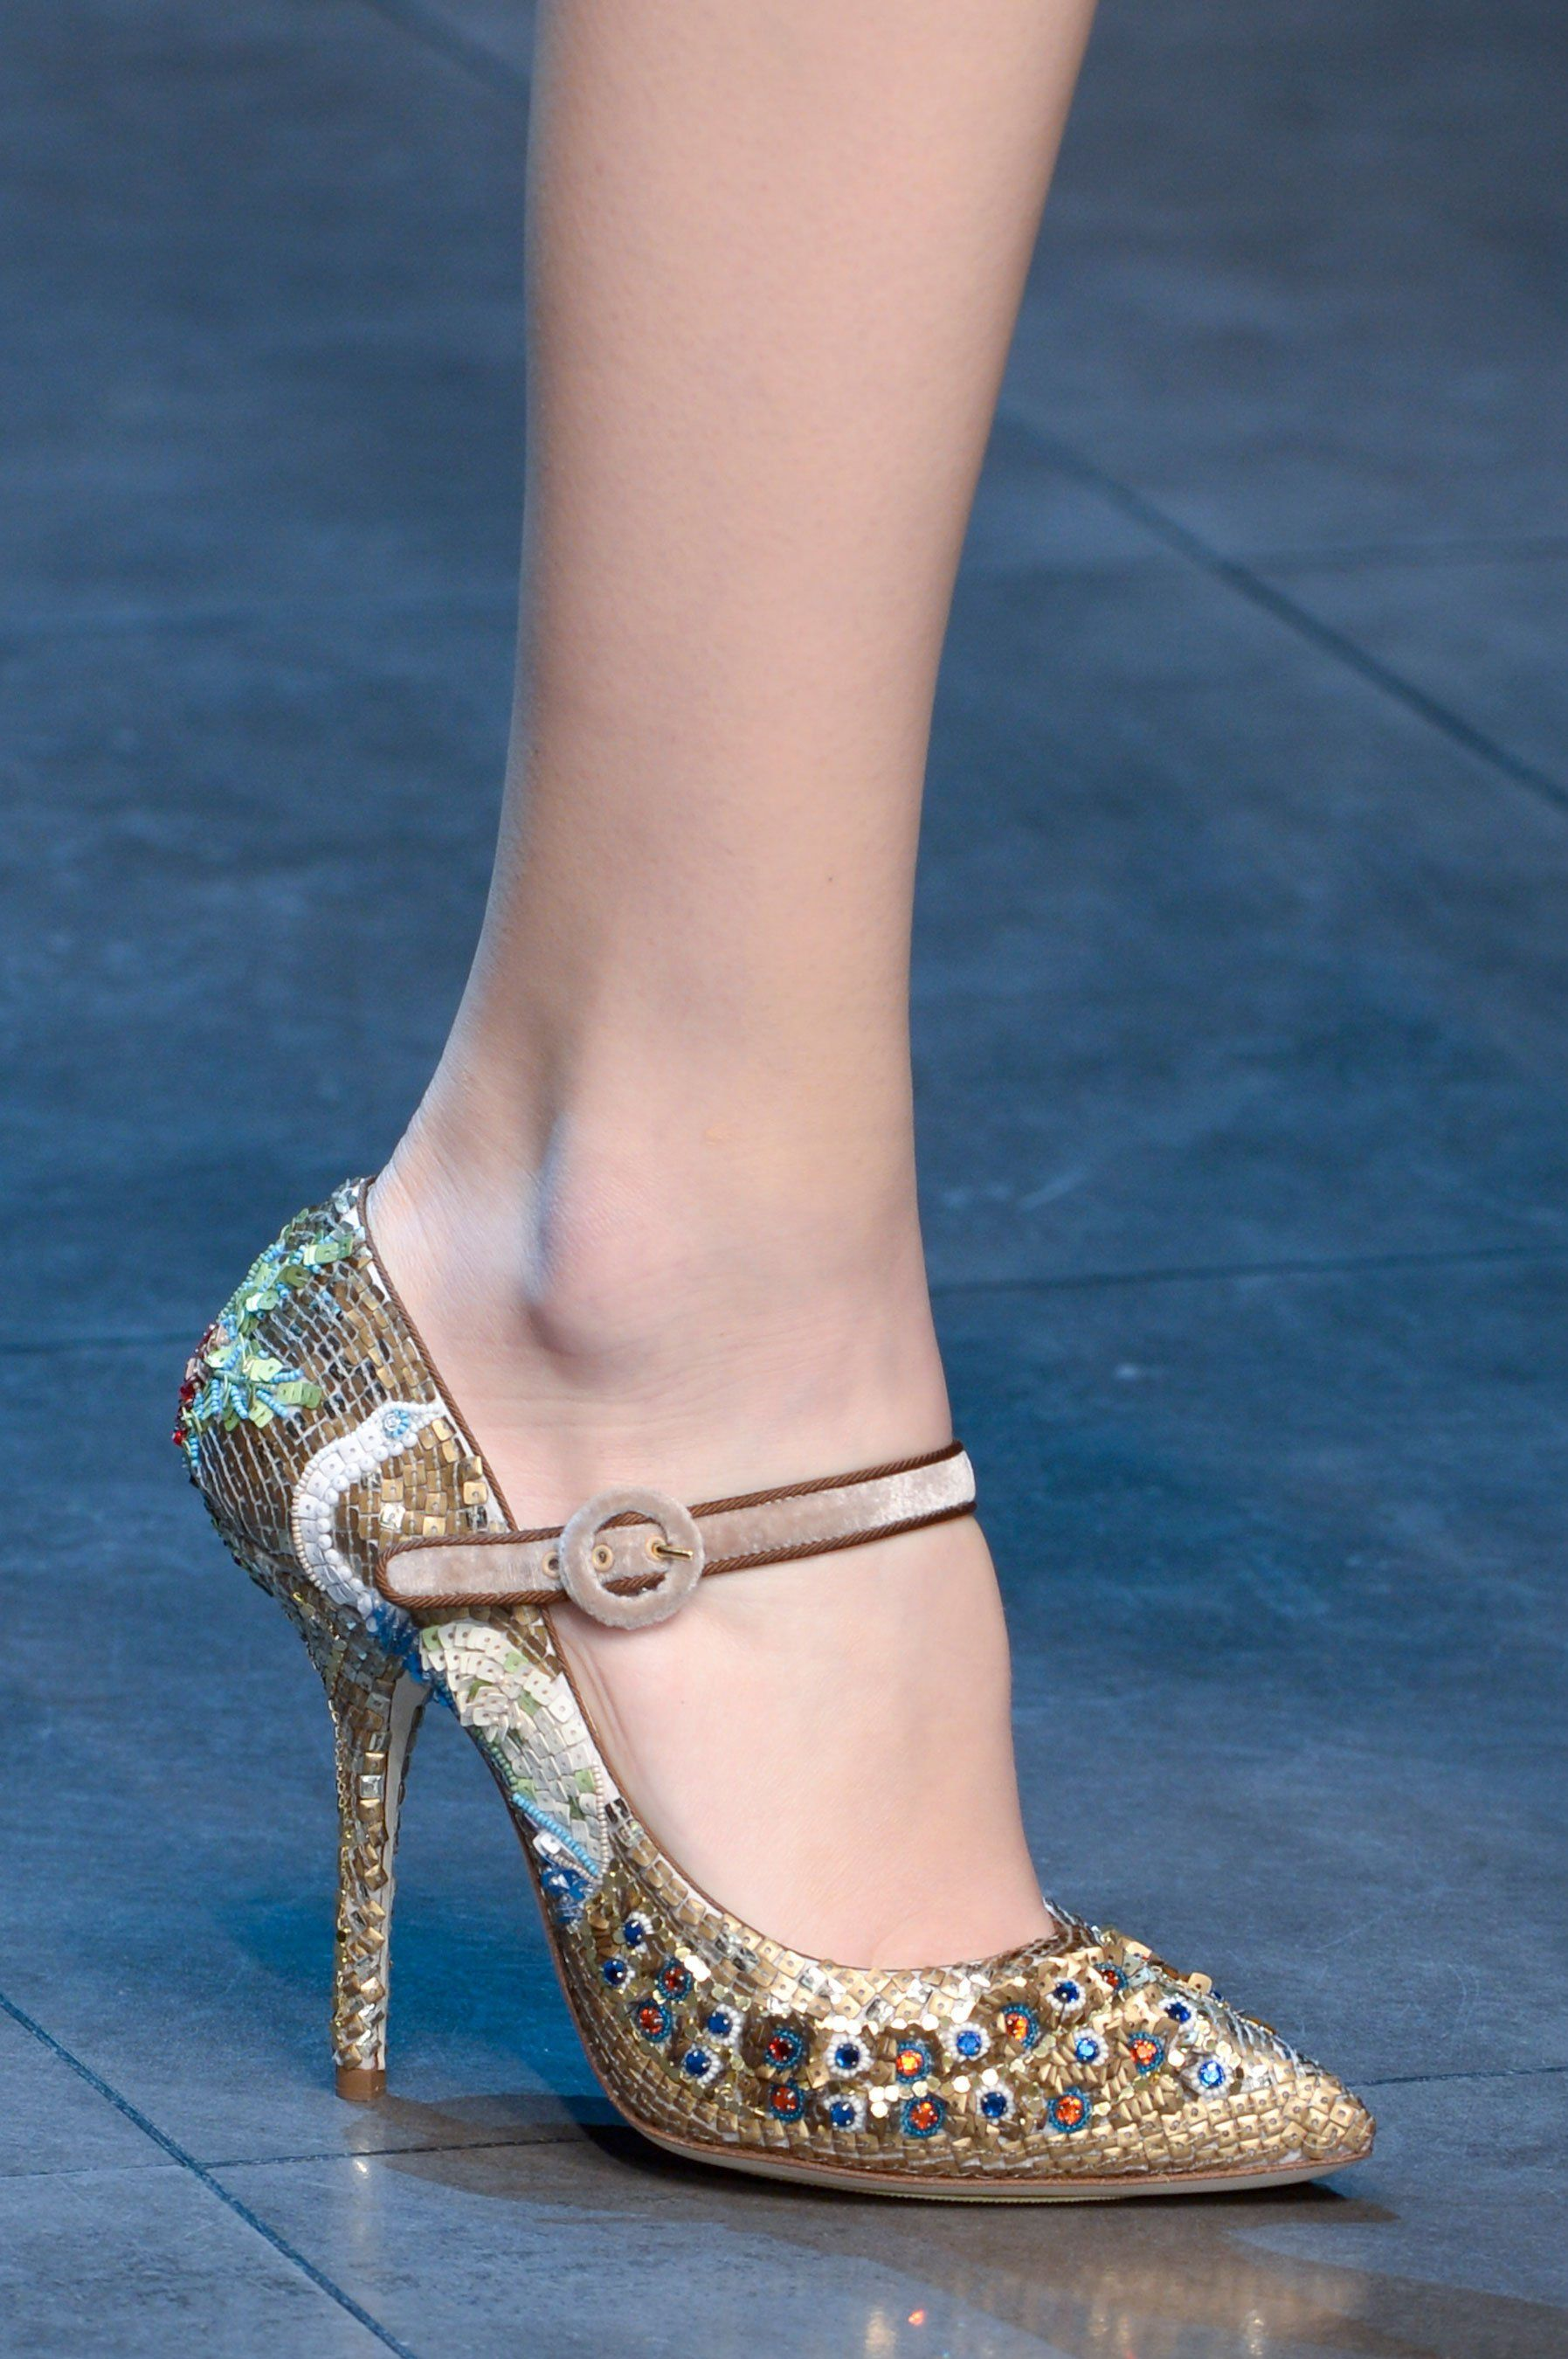 Dolce & Gabbana Details A/W '13